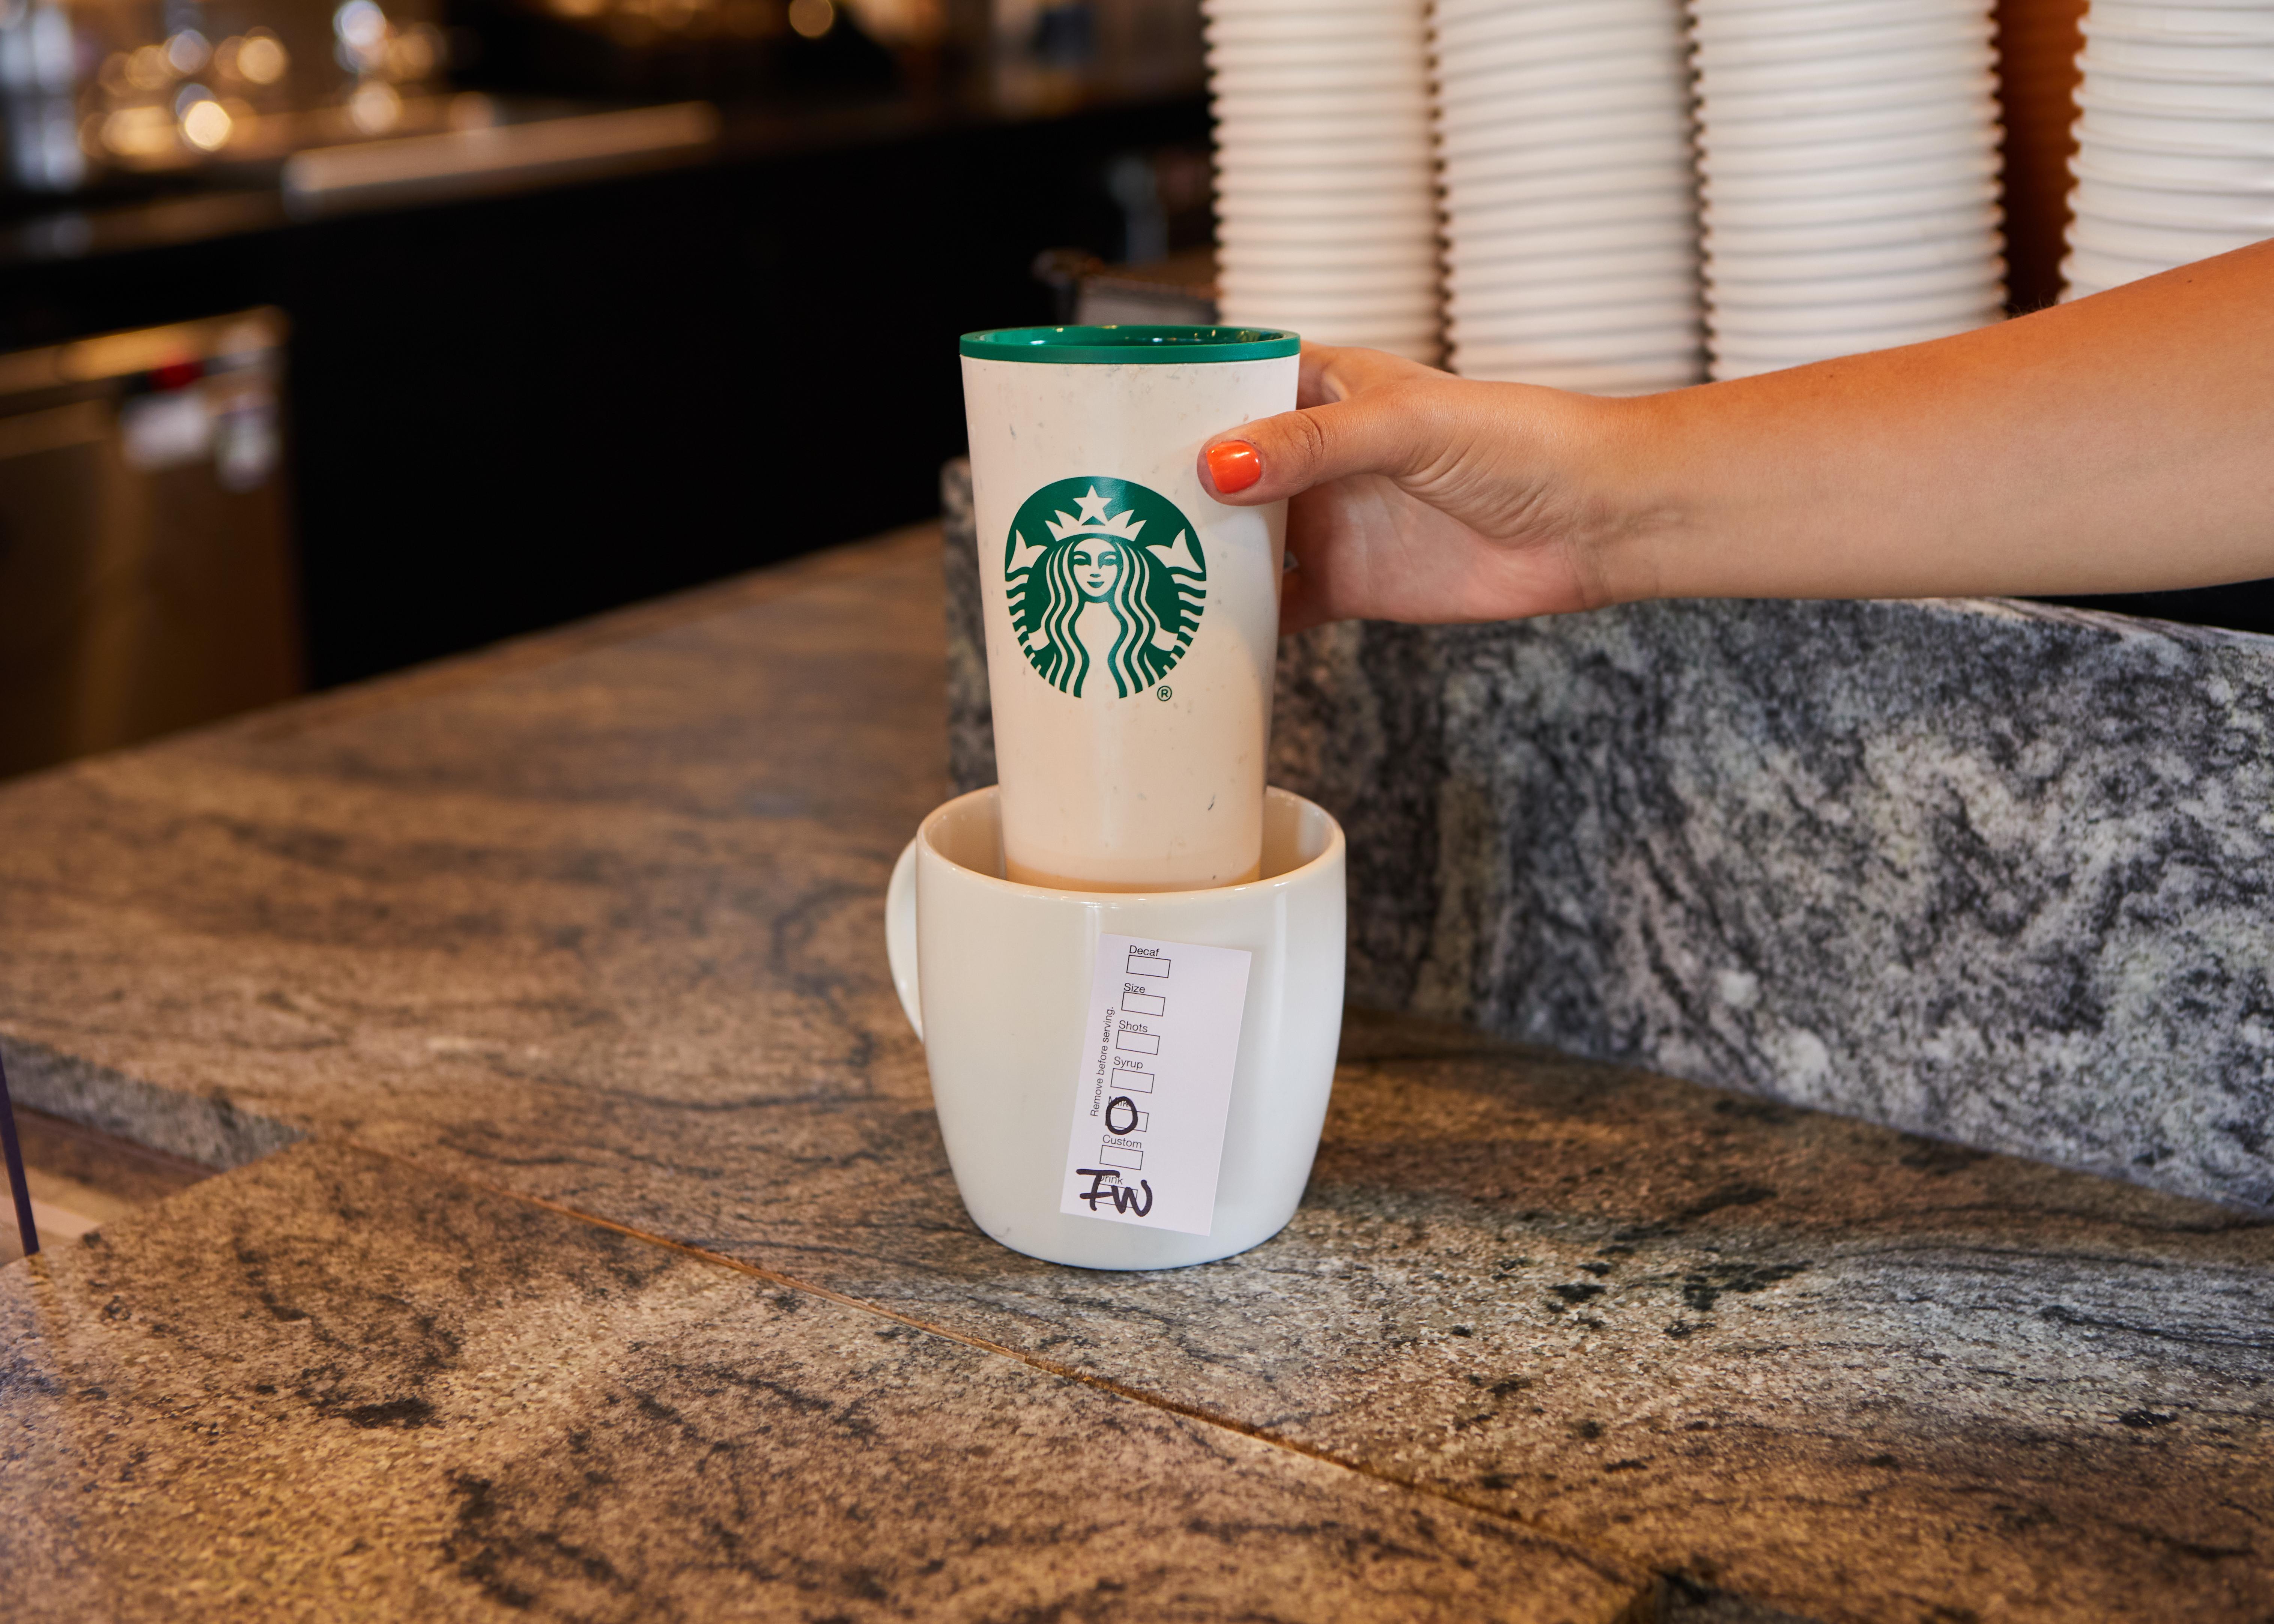 Starbucks Is Ready To Reintroduce Reusables Across Emea Starbucks Stories Emea